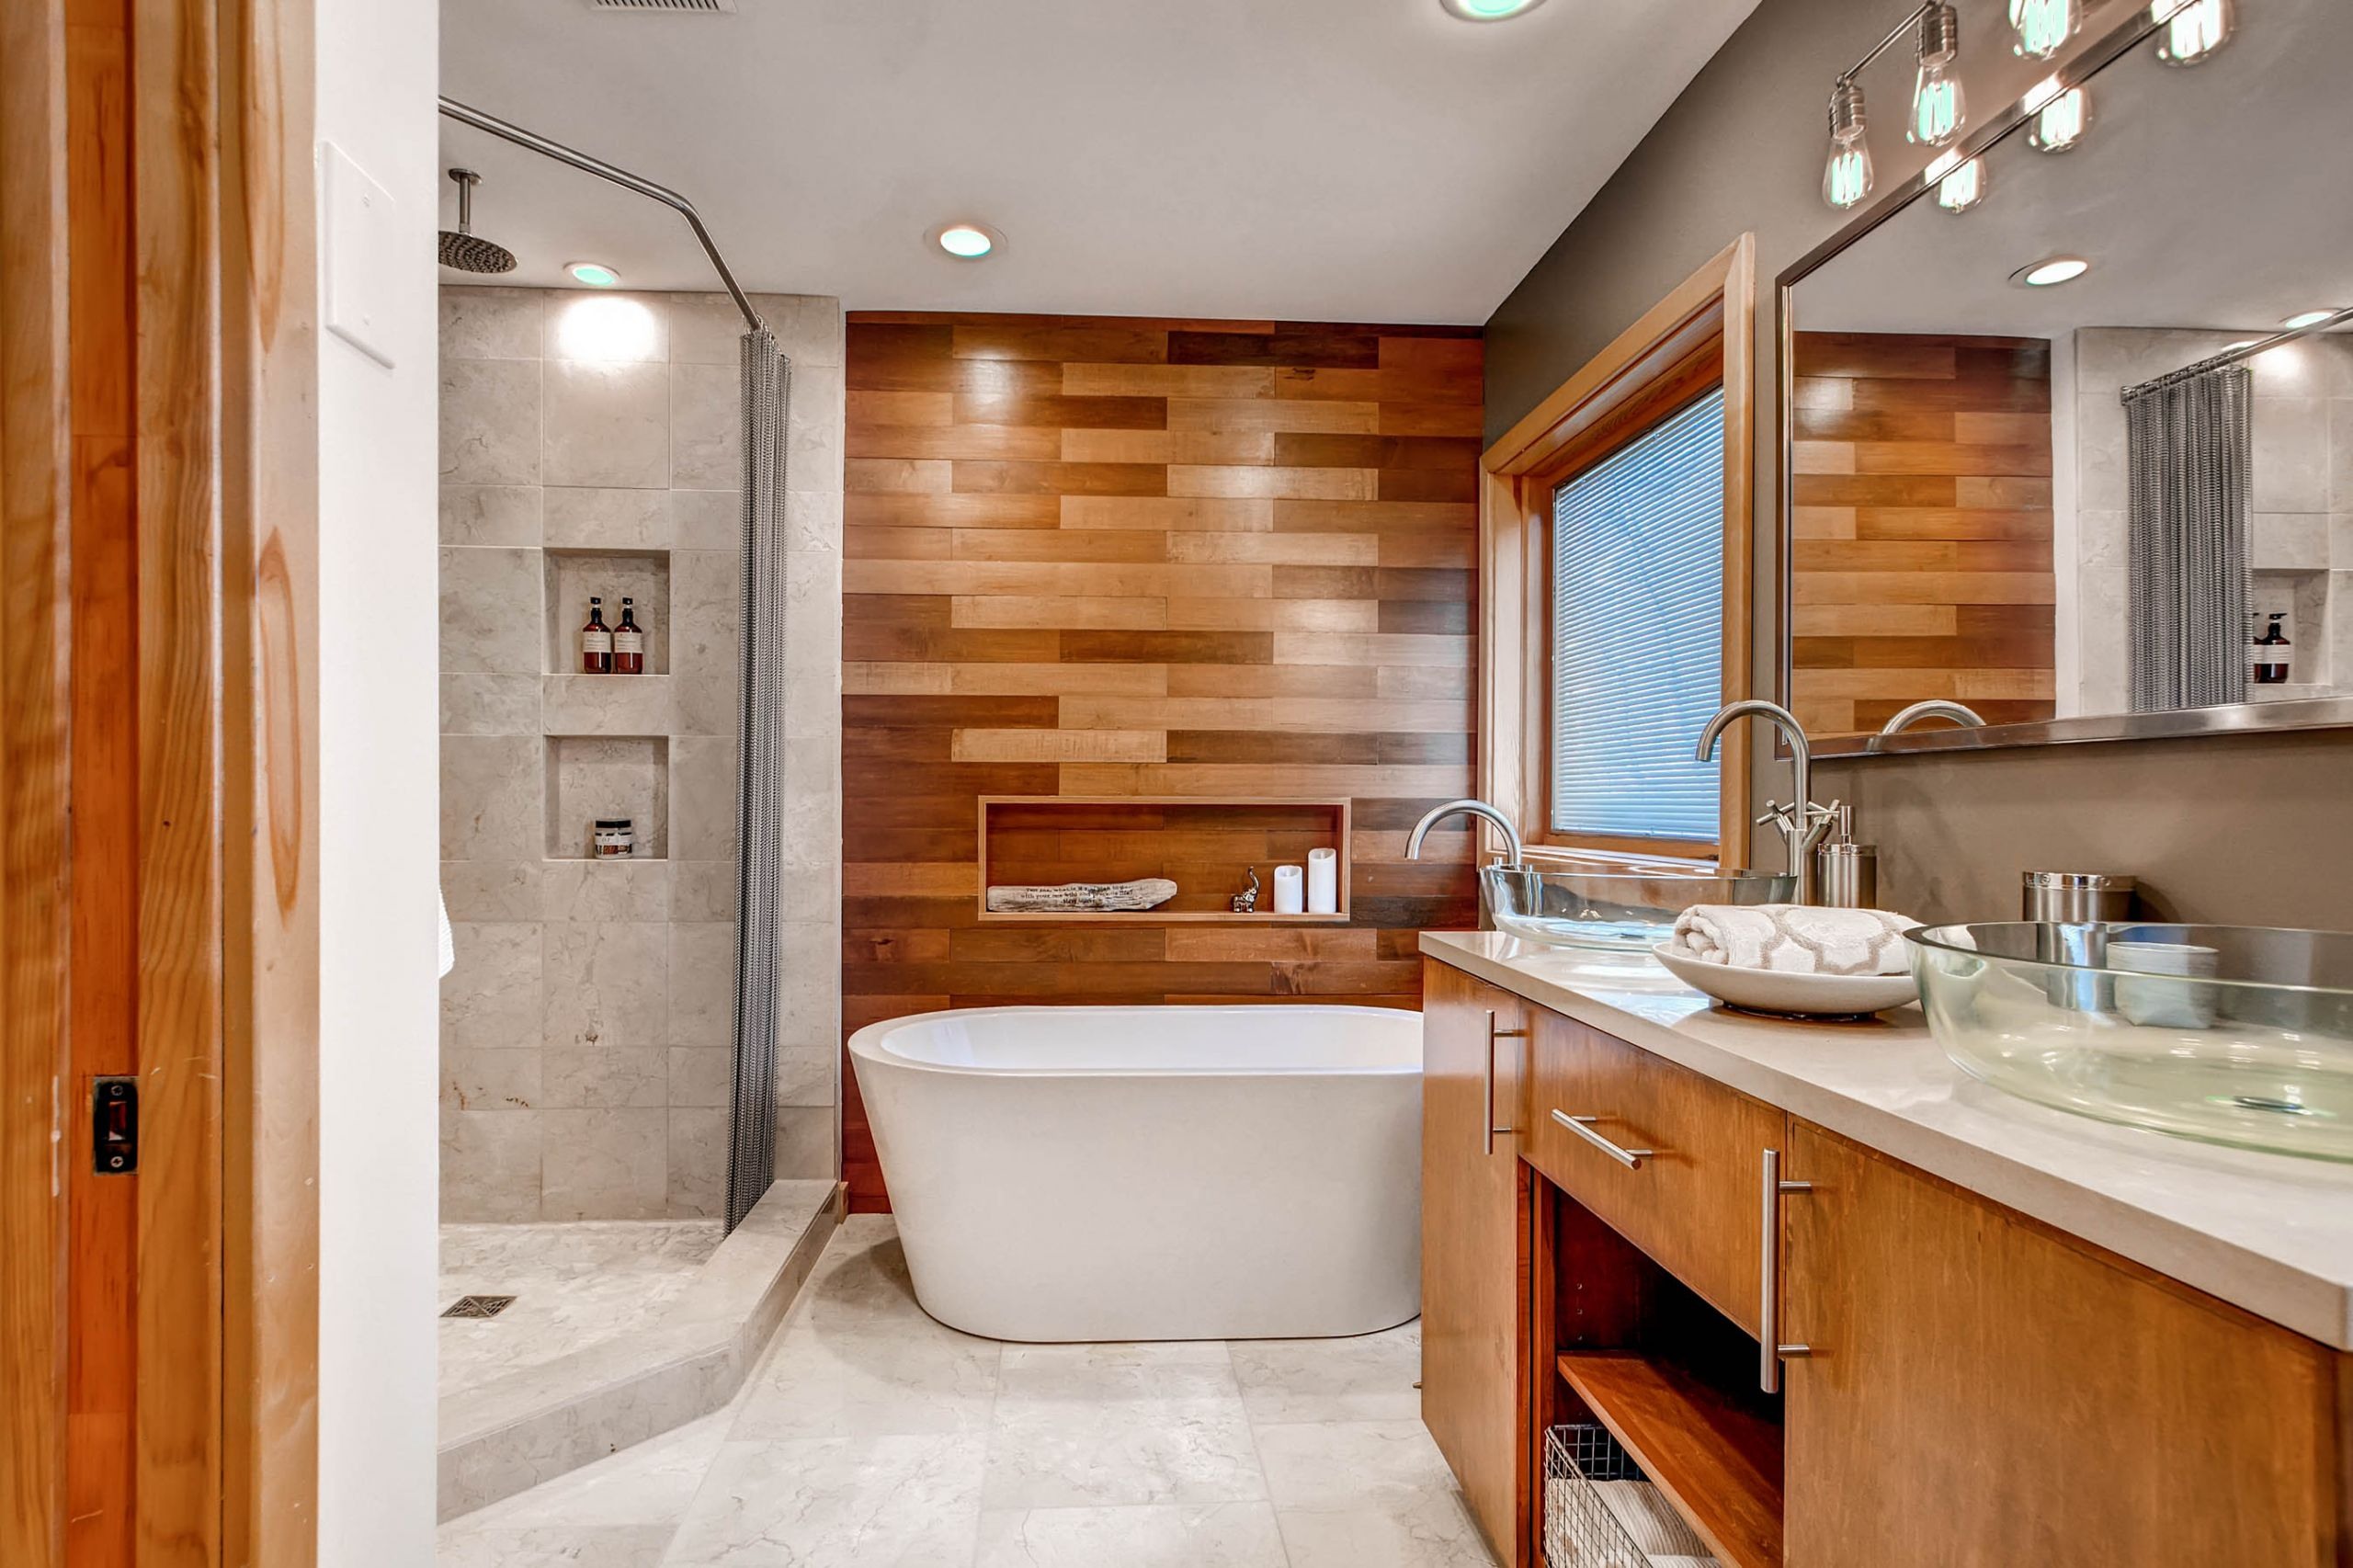 Master Bathroom Pictures  Spa Like Master Bathroom Remodel